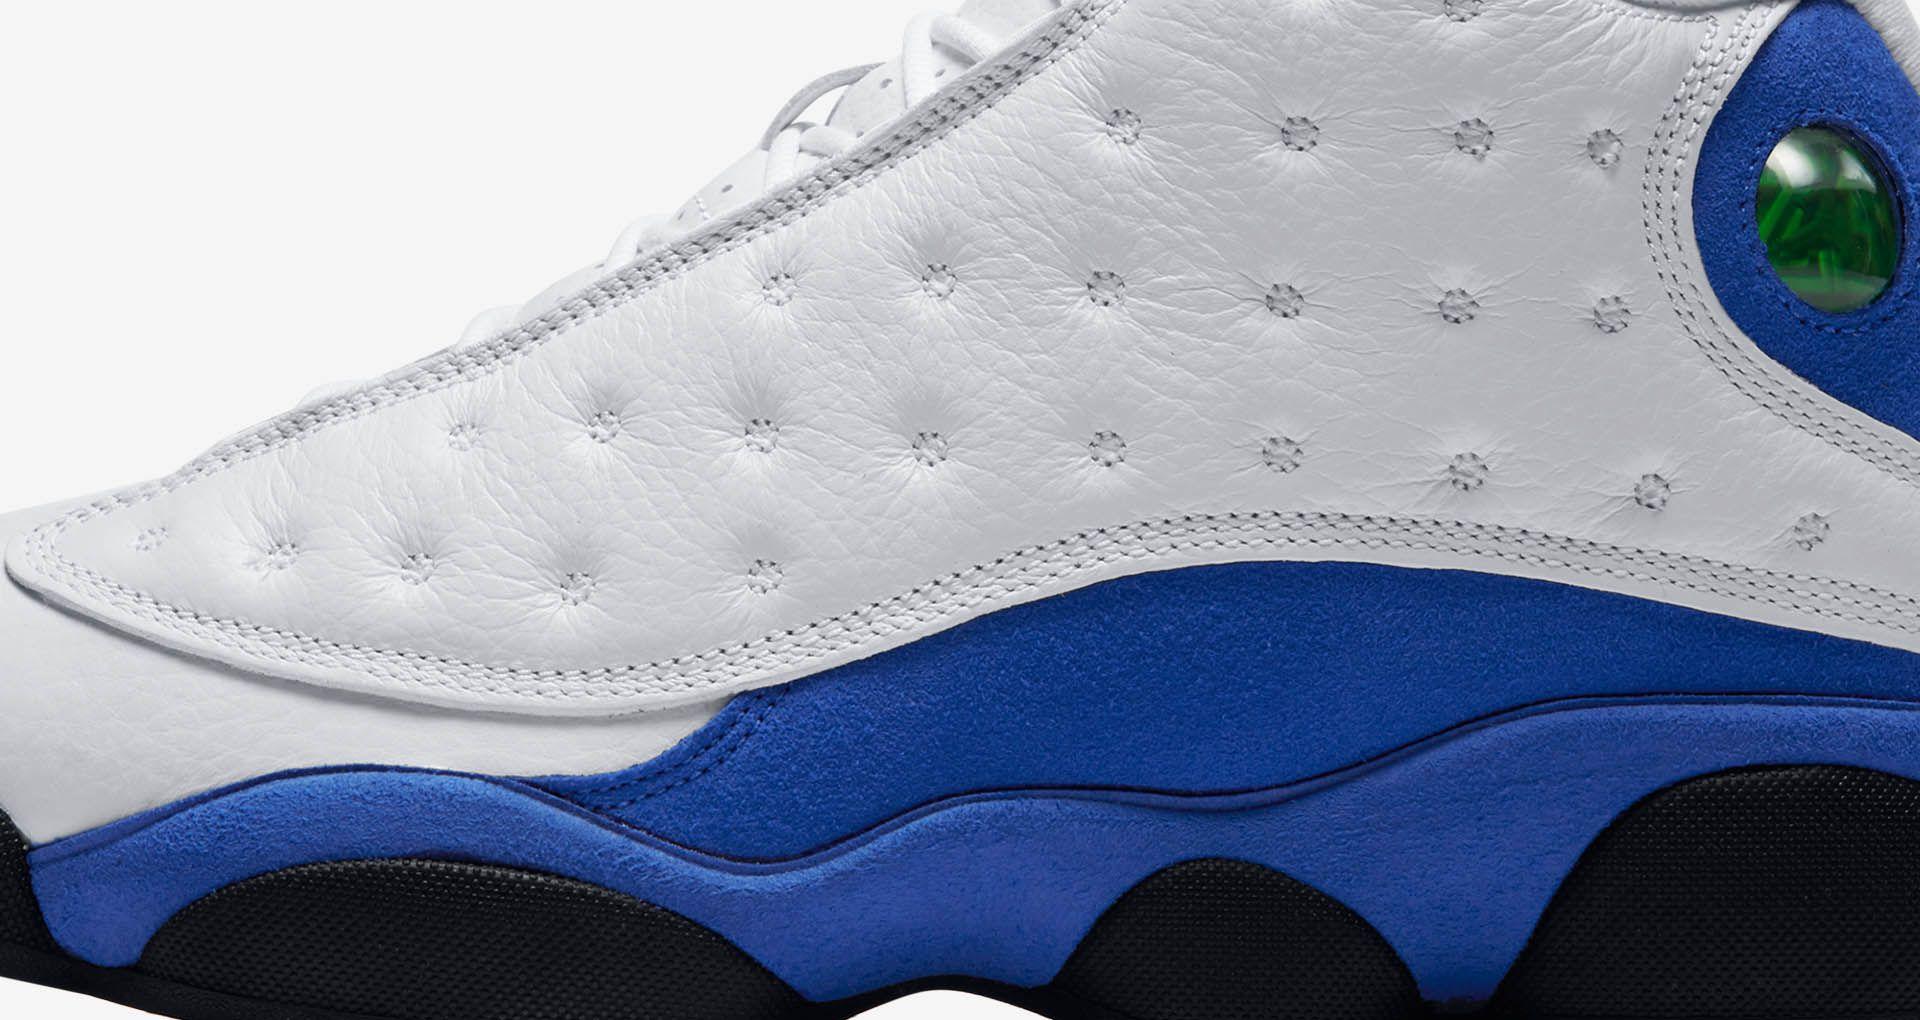 new product 984f3 0b0ed Air Jordan 13 'White & Hyper Royal' Release Date. Nike+ SNKRS